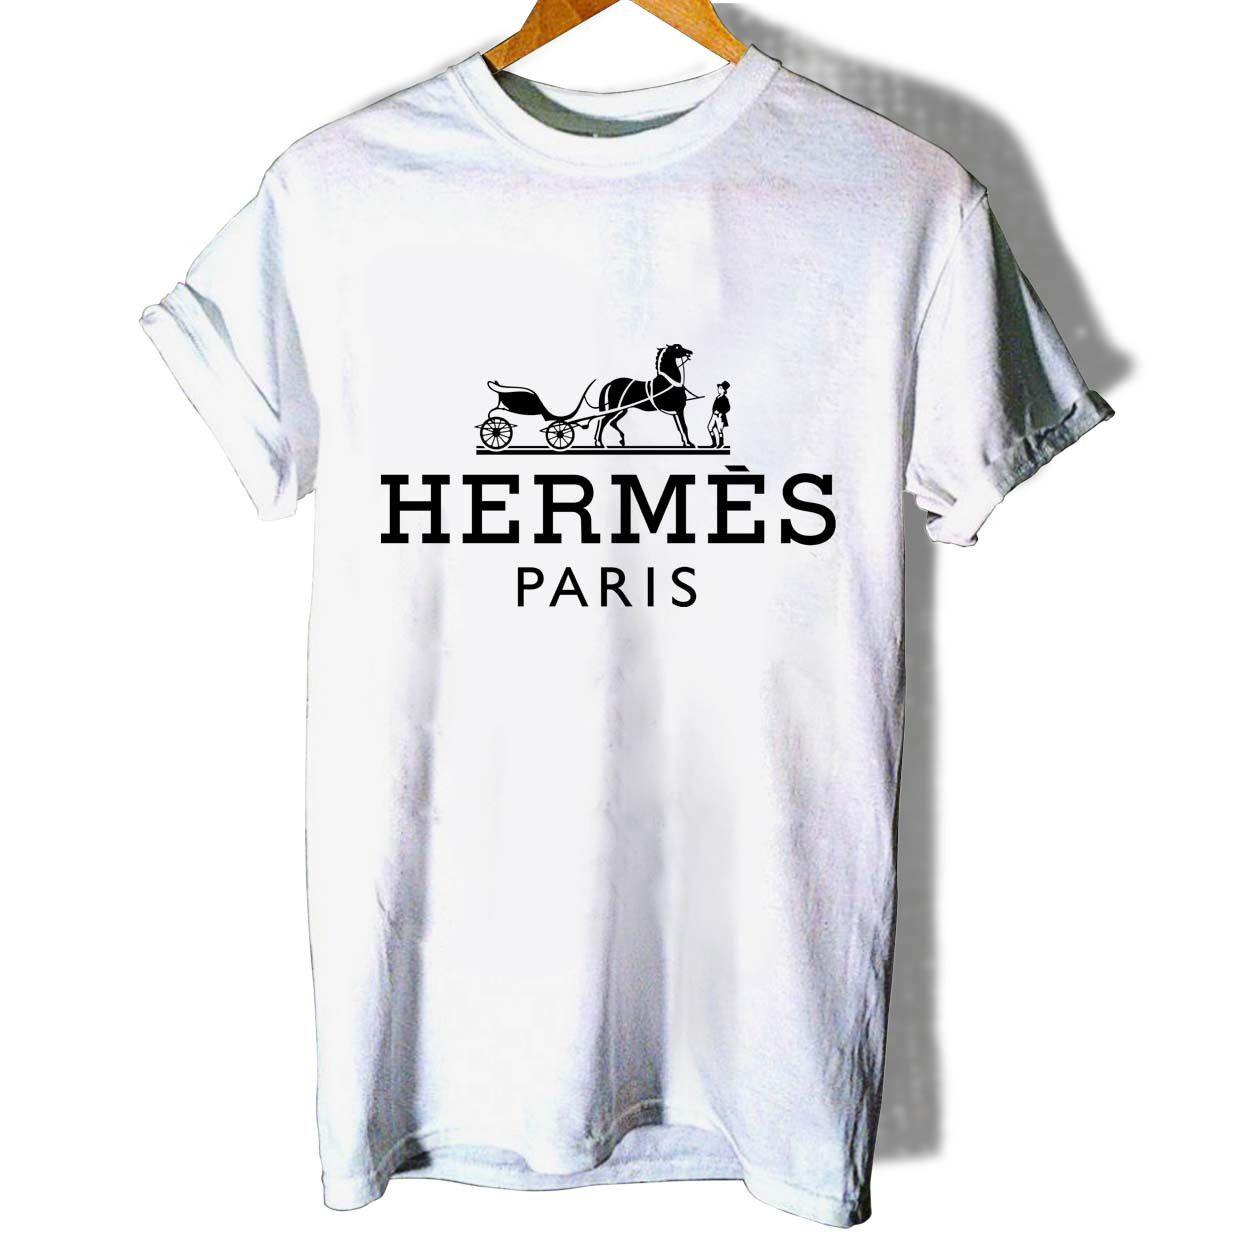 0c52c6d92e0f Hermes paris Logo T Shirt Women